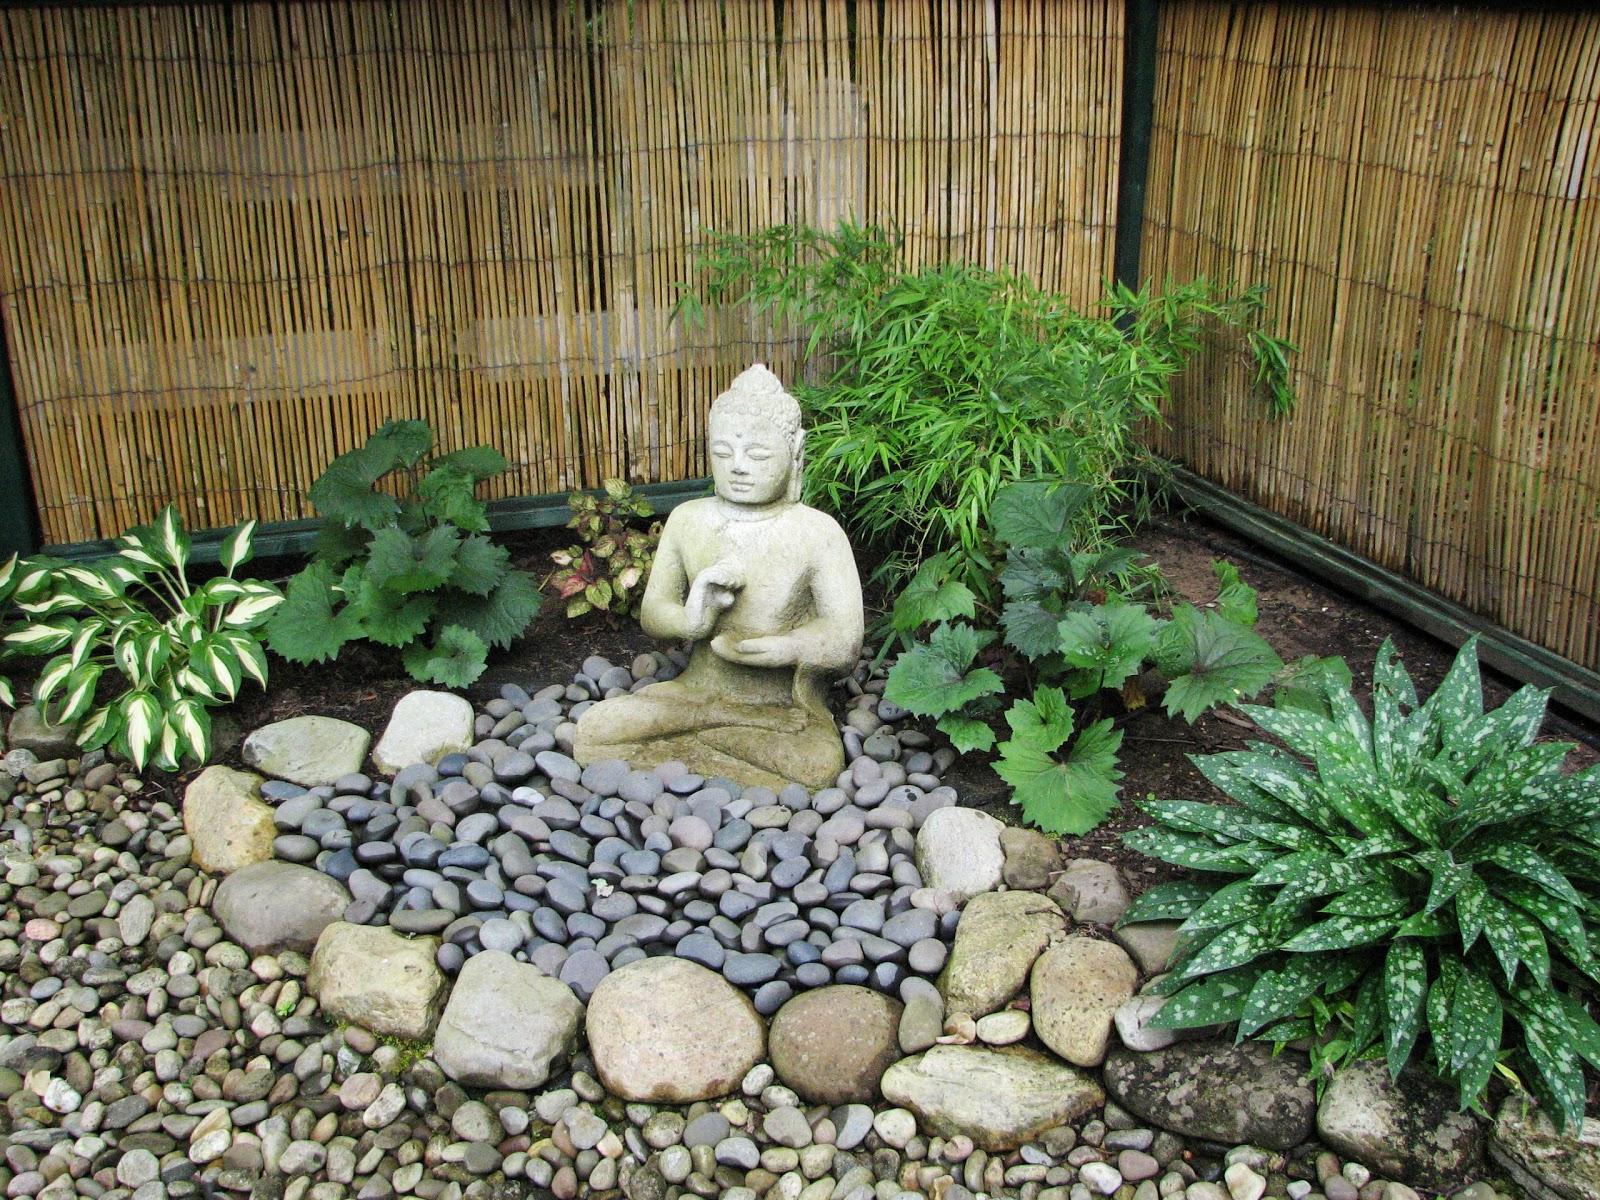 Jardin Zen Avec Bouddha My Zen Garden Lanterns And Landscape ... intérieur Bouddha Deco Jardin